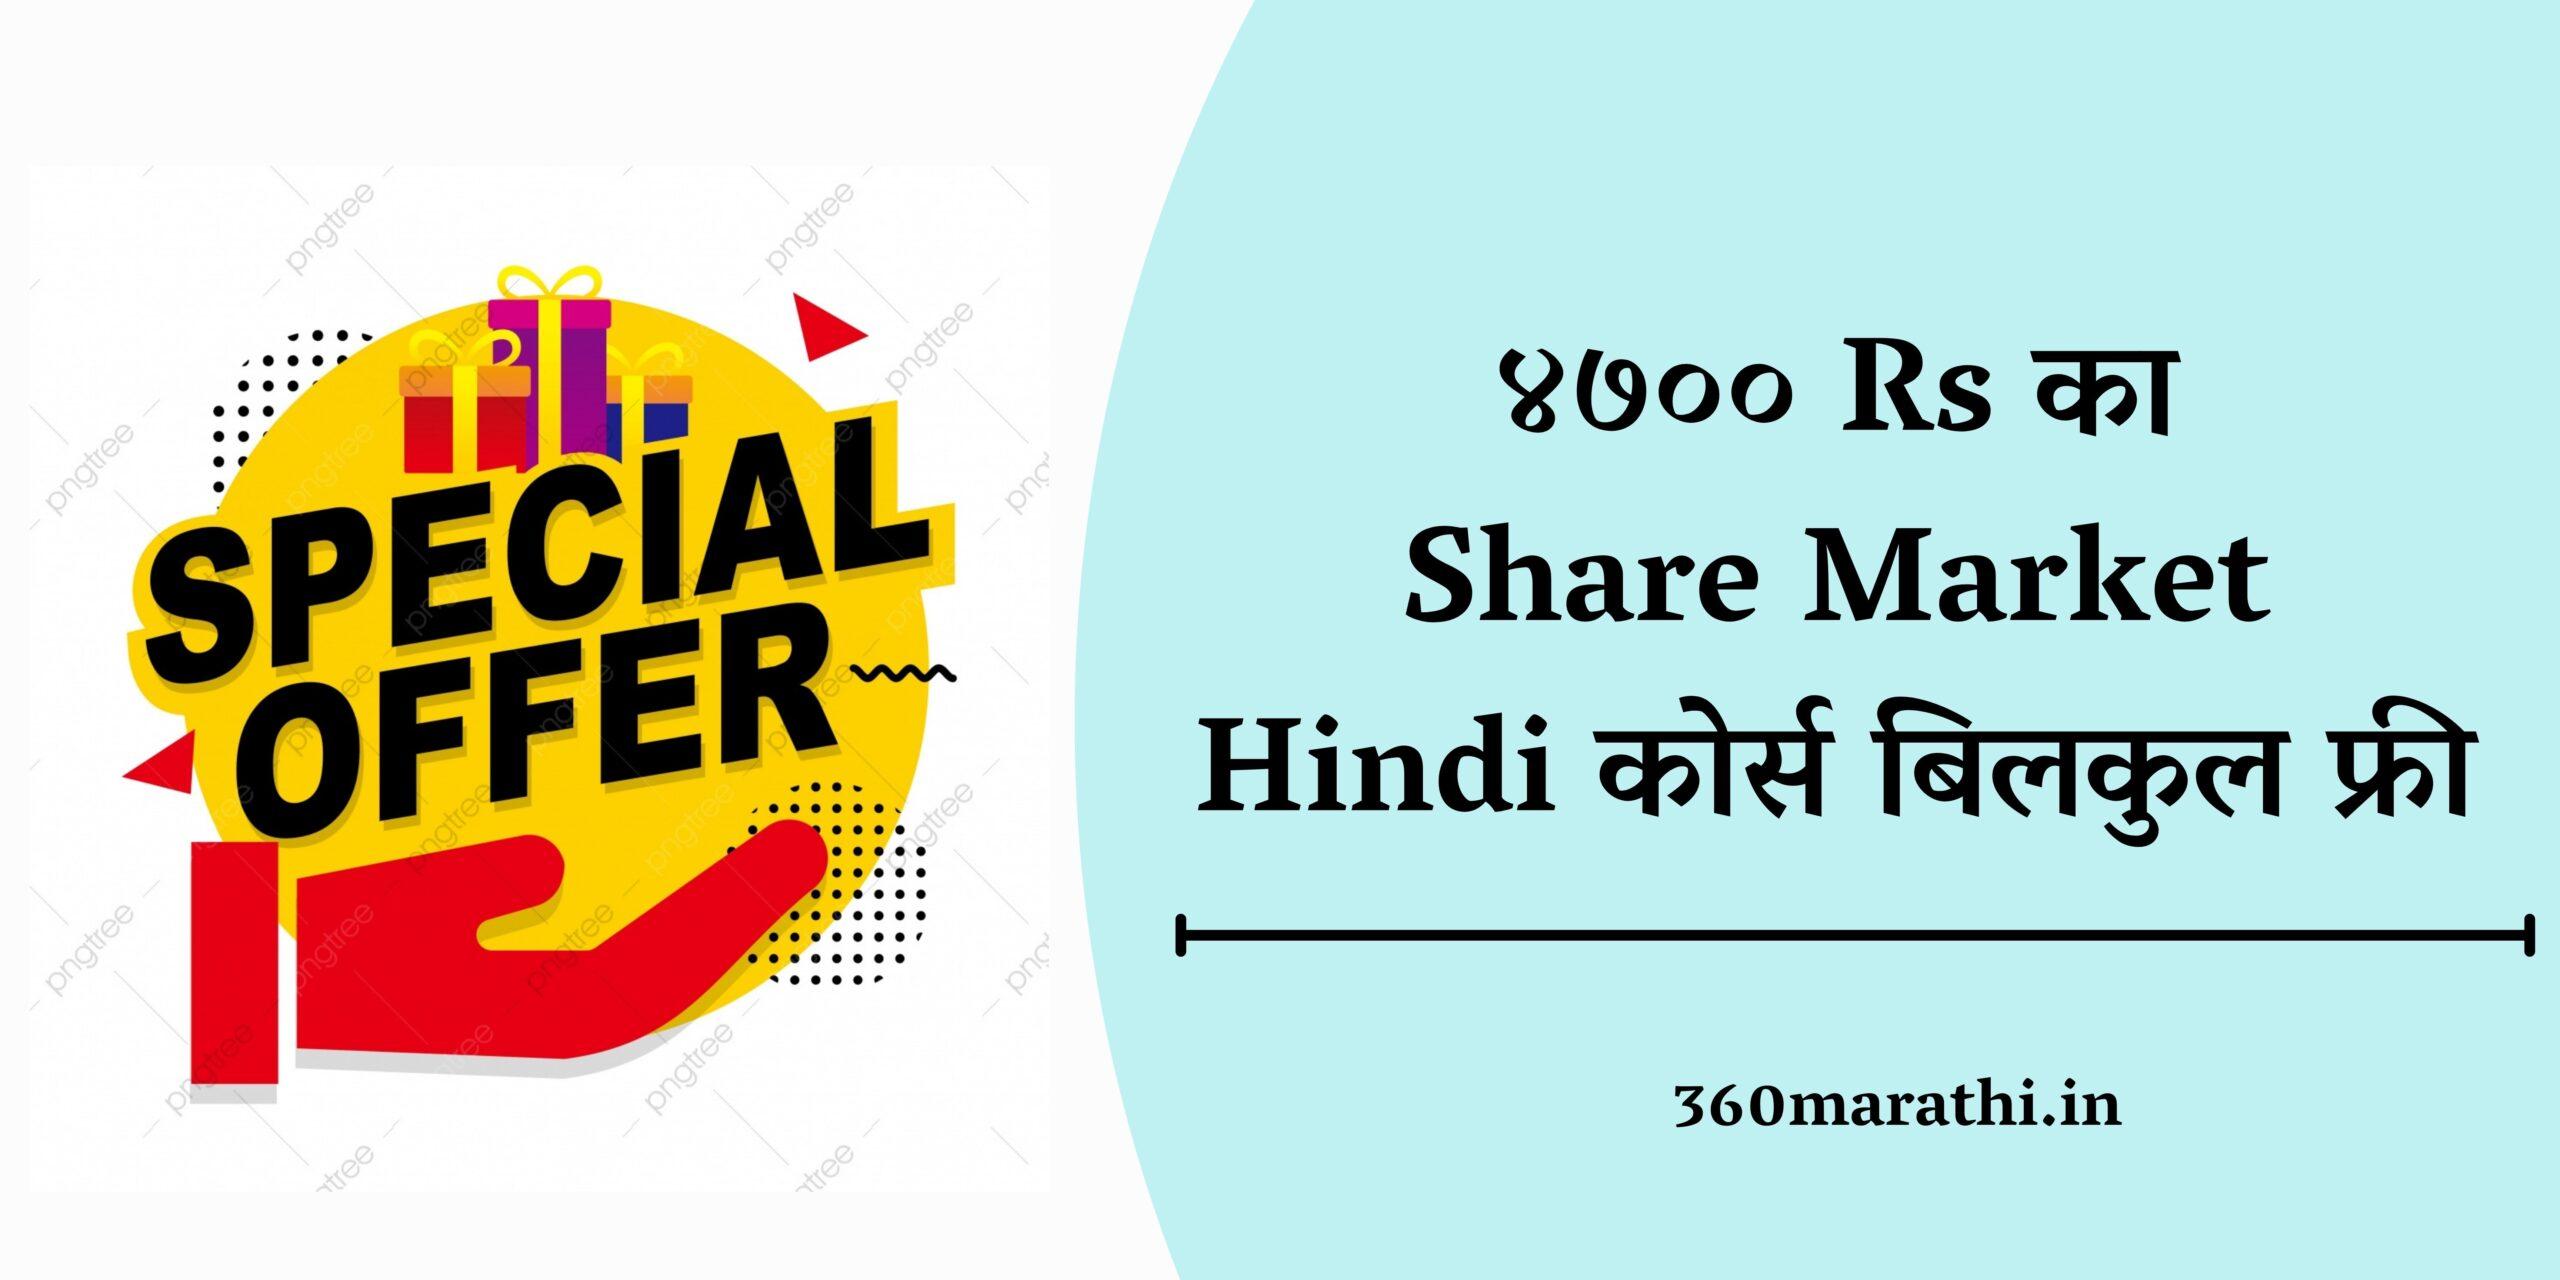 Share Market Courses Online Free in Hindi 【४७०० Rs का शेयर मार्केट कोर्स Free】